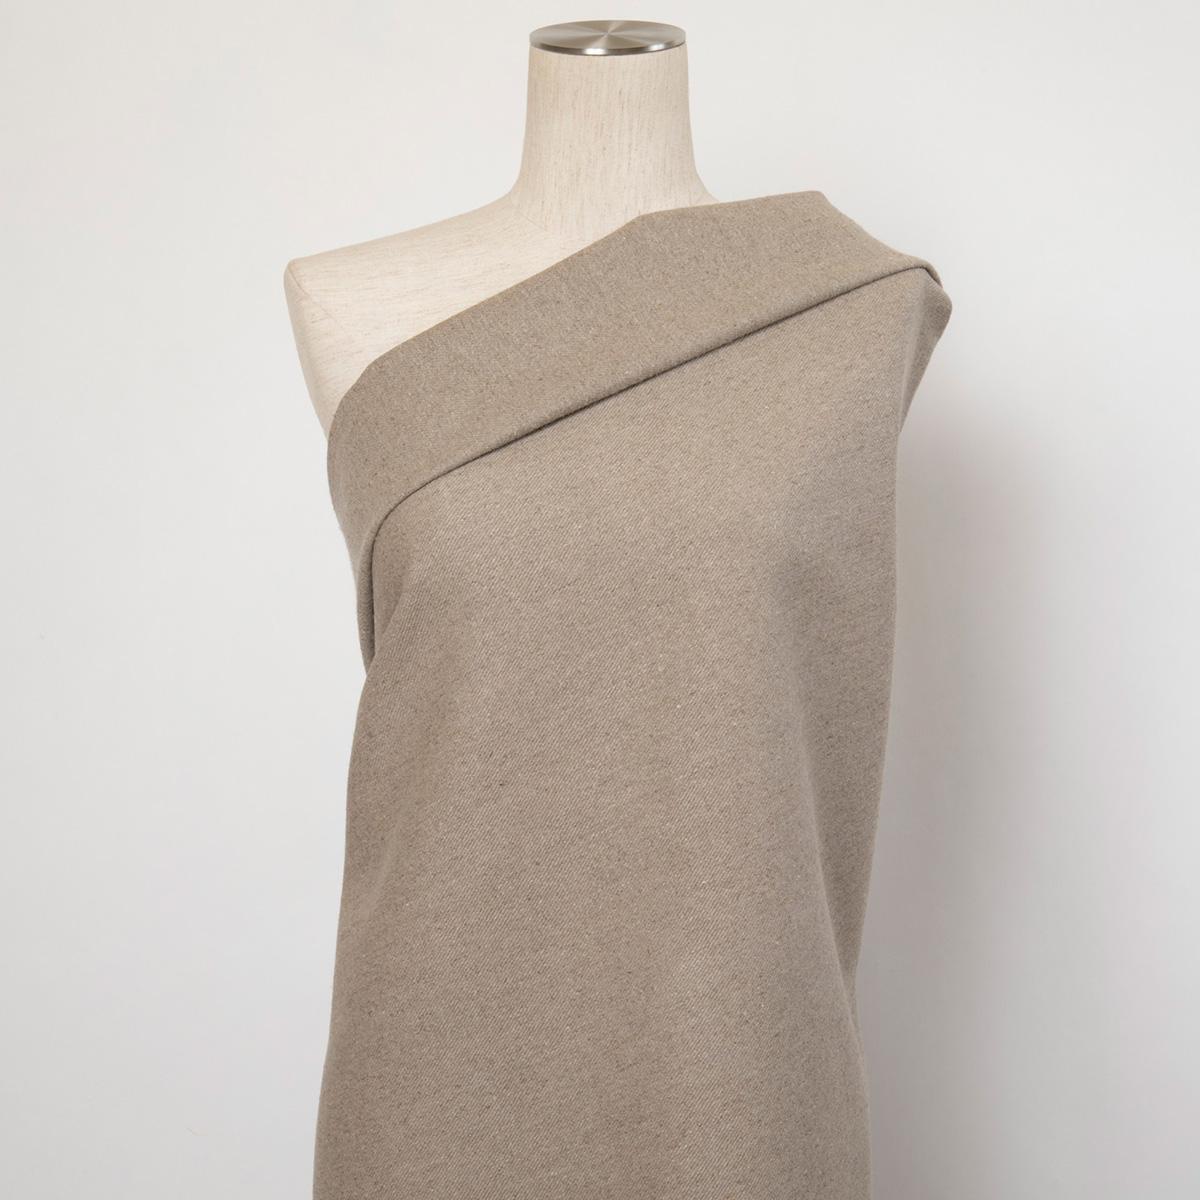 155cm巾 【 リネン 100%  生地  】ナチュラル 無地 極厚地 ツイル 1m単位 R1-45【カーテン、コートに最適】